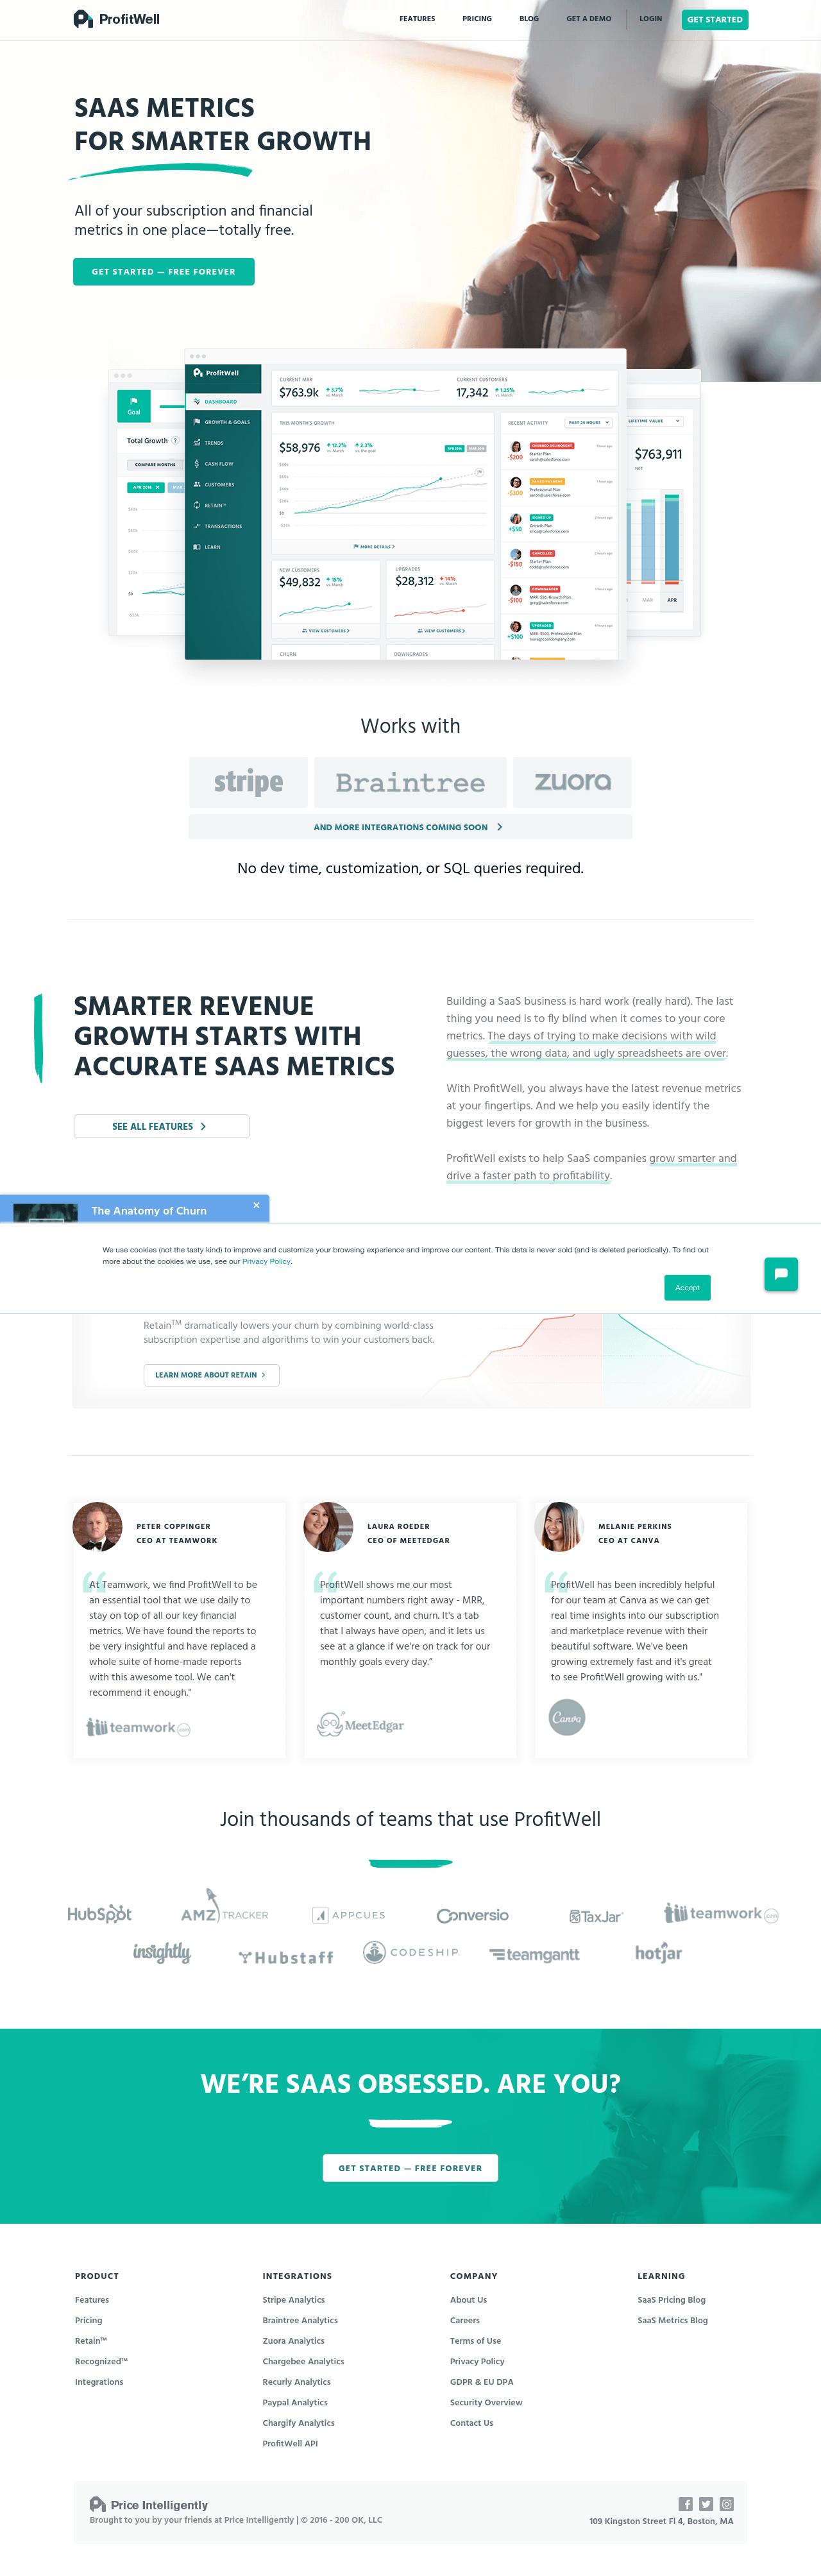 httpswww.profitwell.com